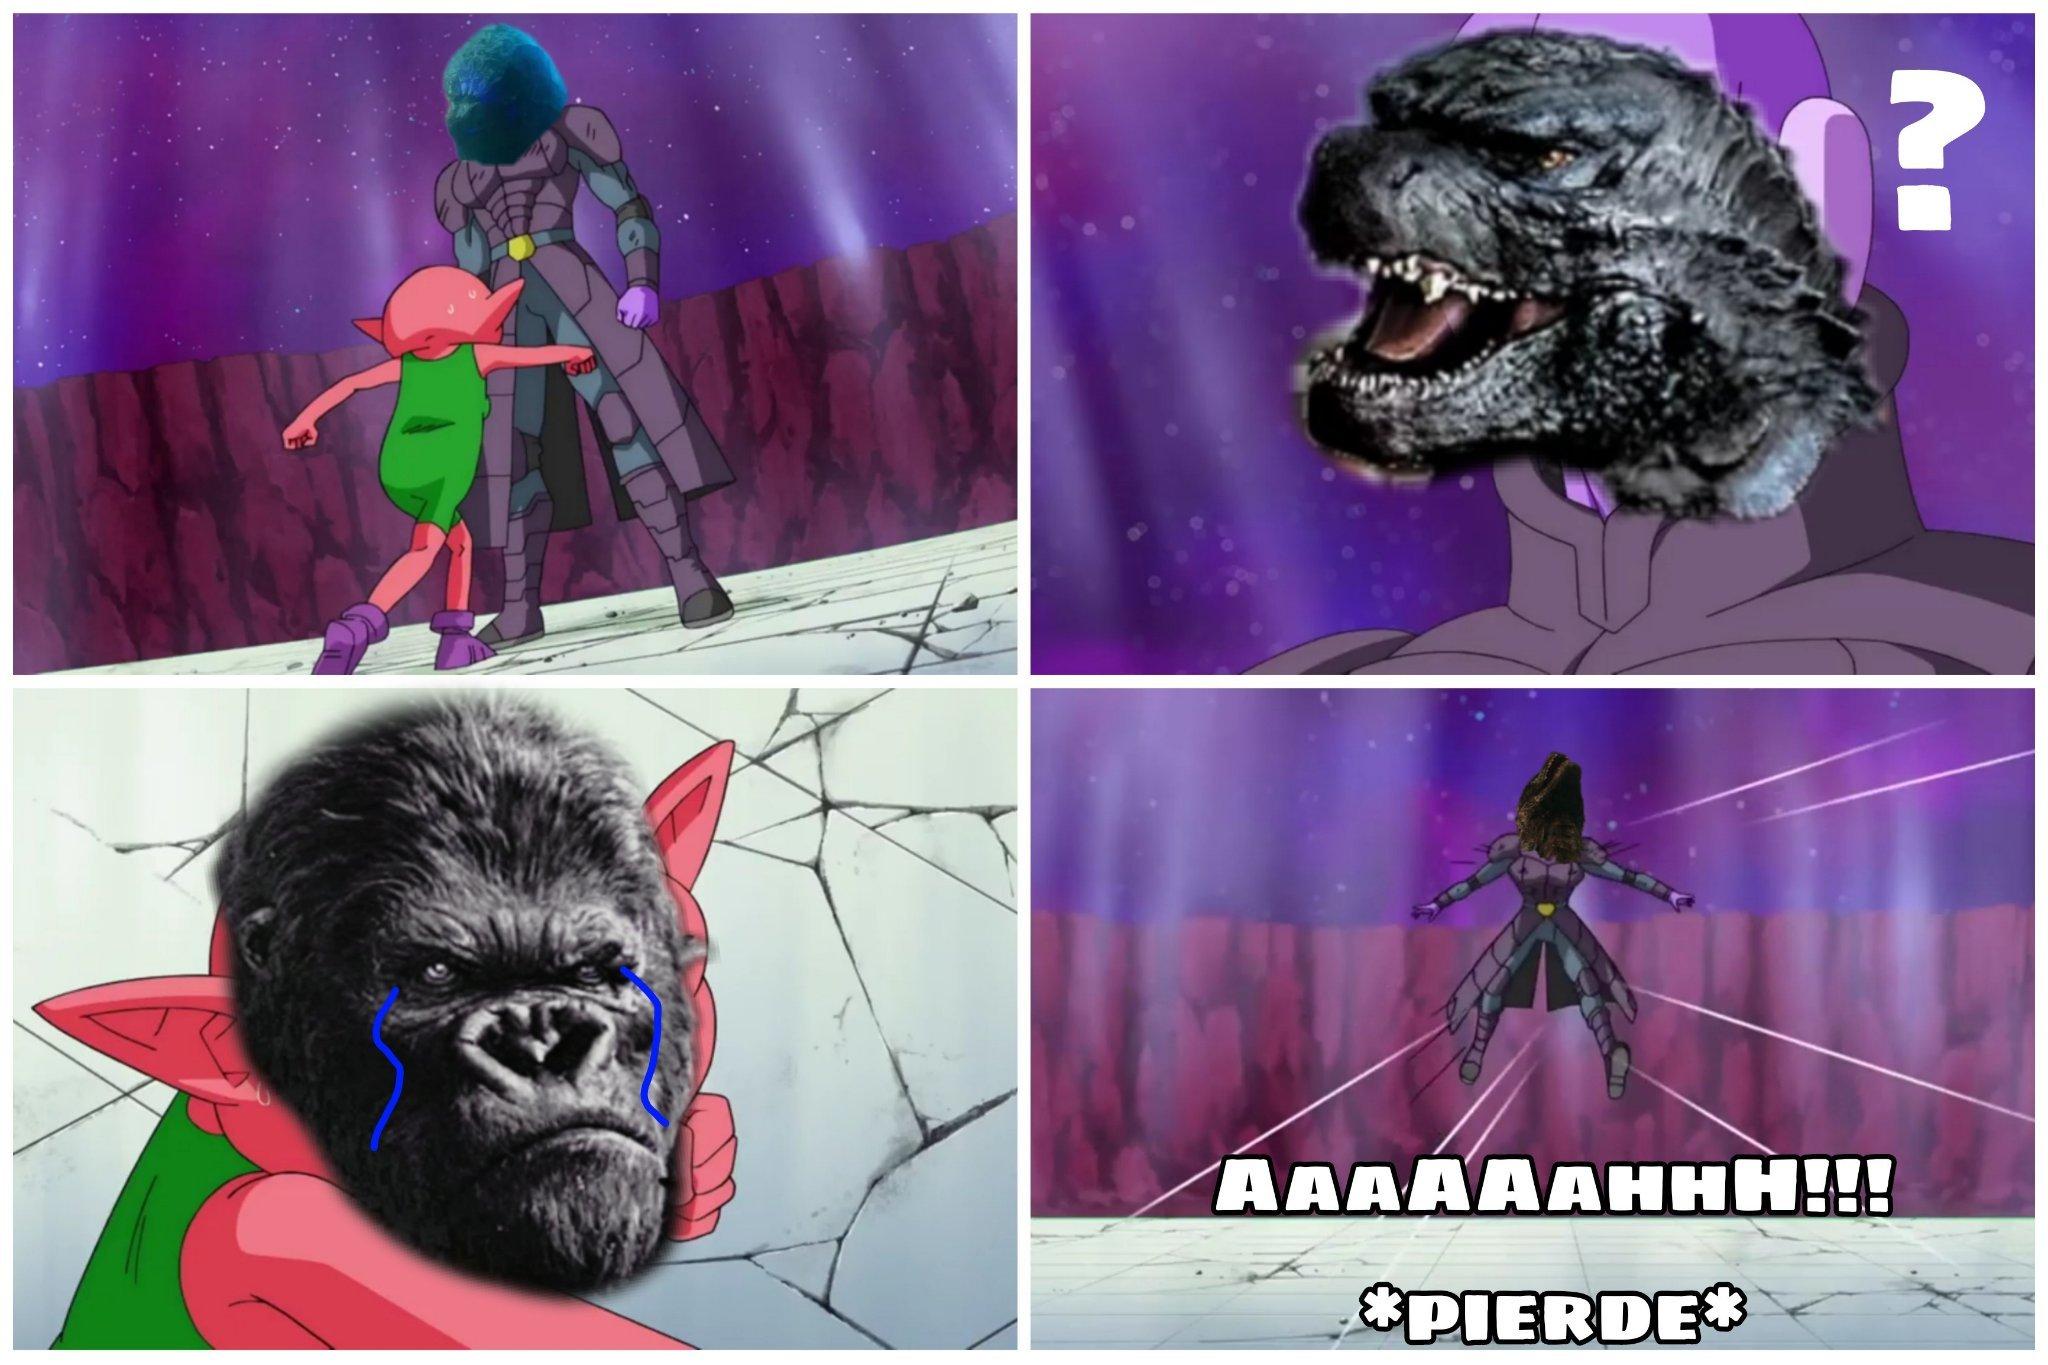 Básicamente asi será el final de Godzilla vs Kong - meme